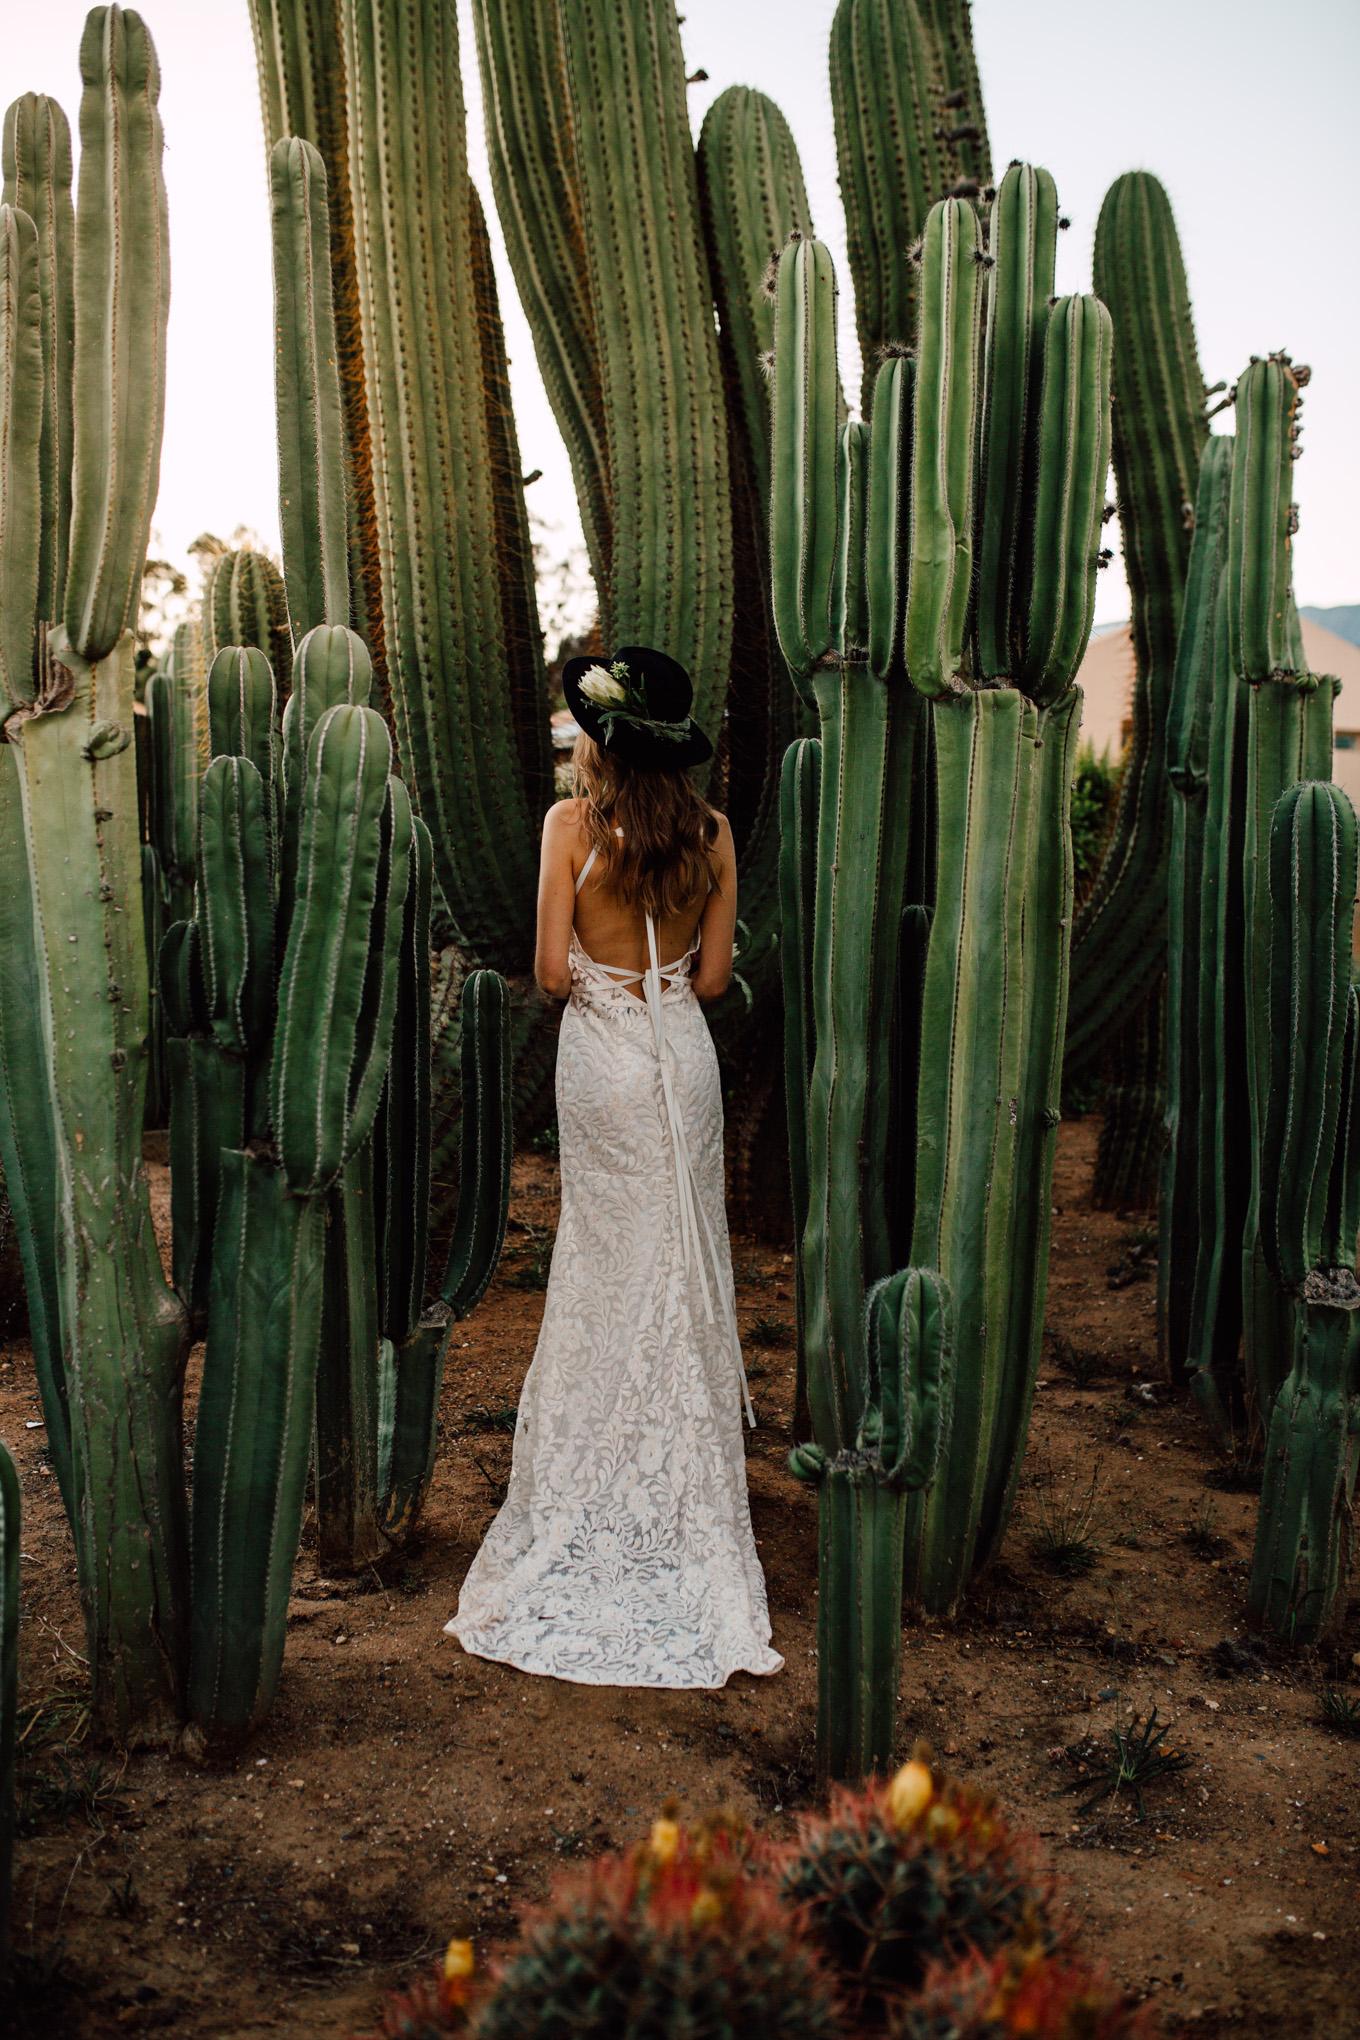 Cape-Town-Pia-Anna-Christian-Wedding-Photography-South-Africa-Bride-Cactus-31.jpg